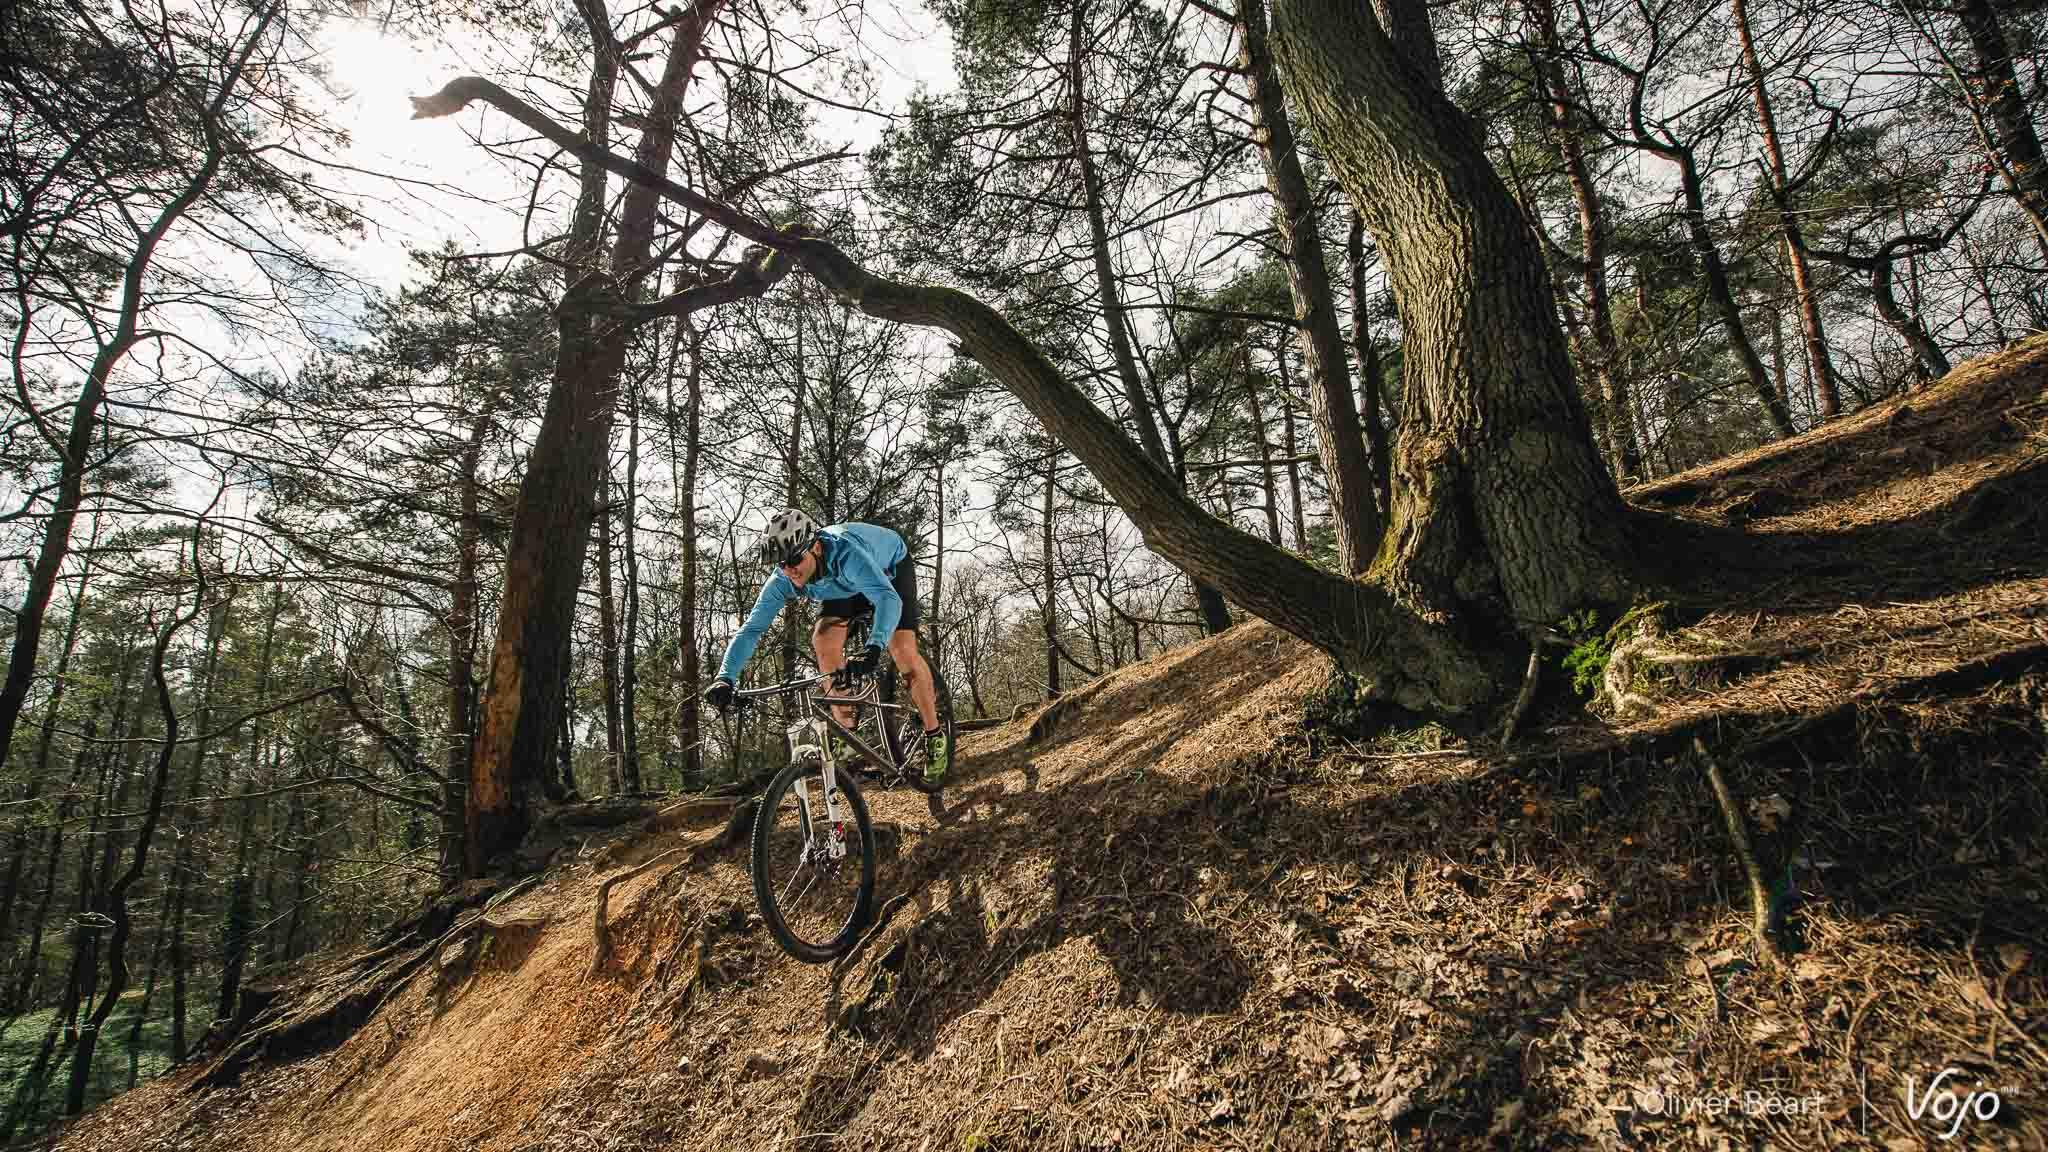 cycles_leon_decouverte_copyright_obeart_vojomag-1-2